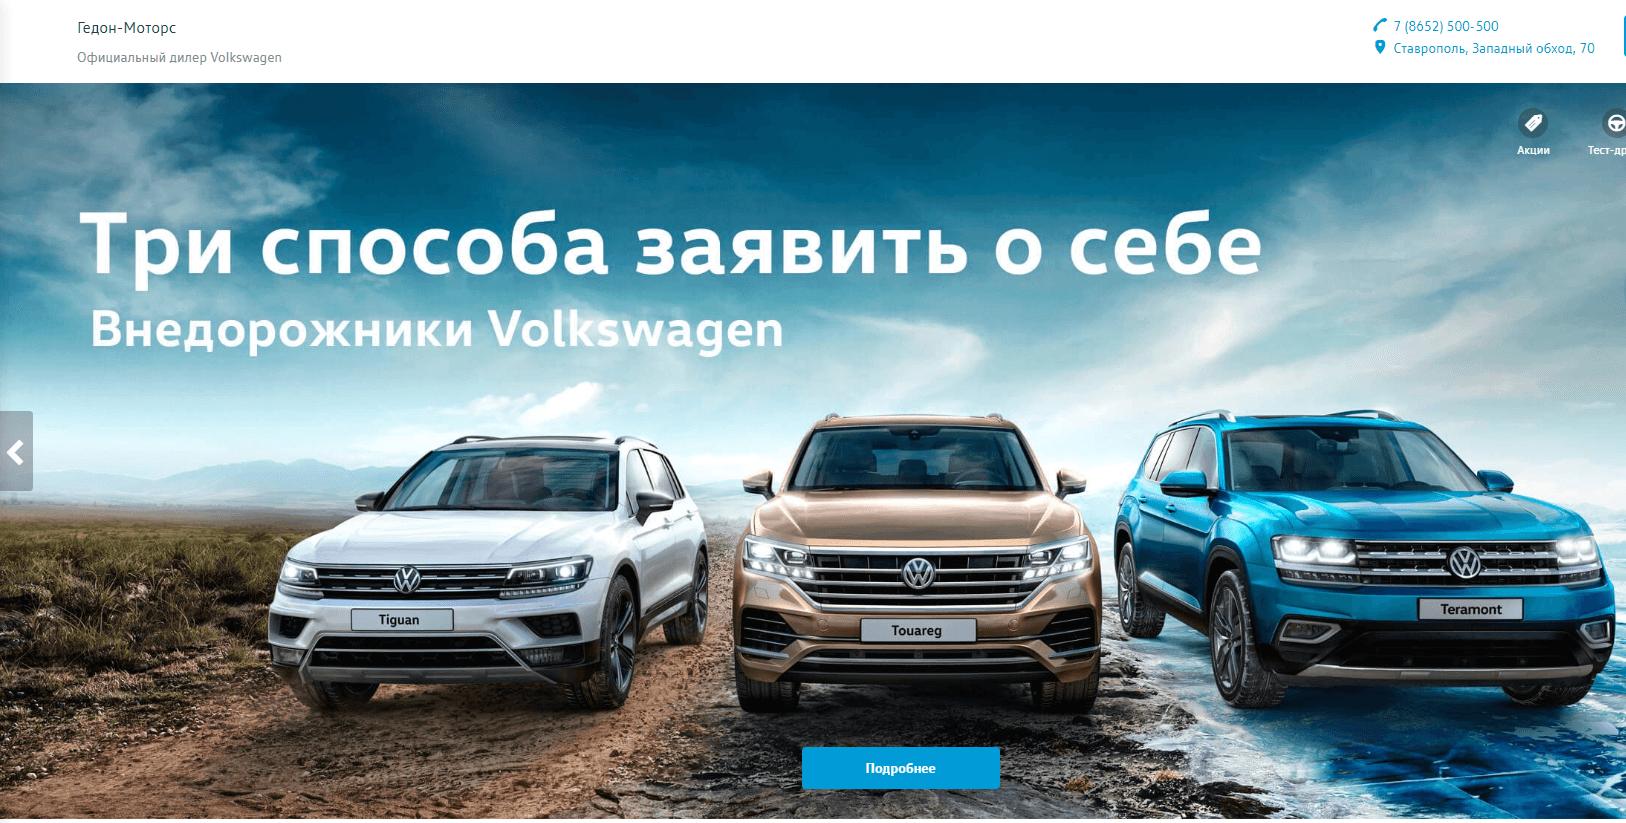 Гедон-Моторс